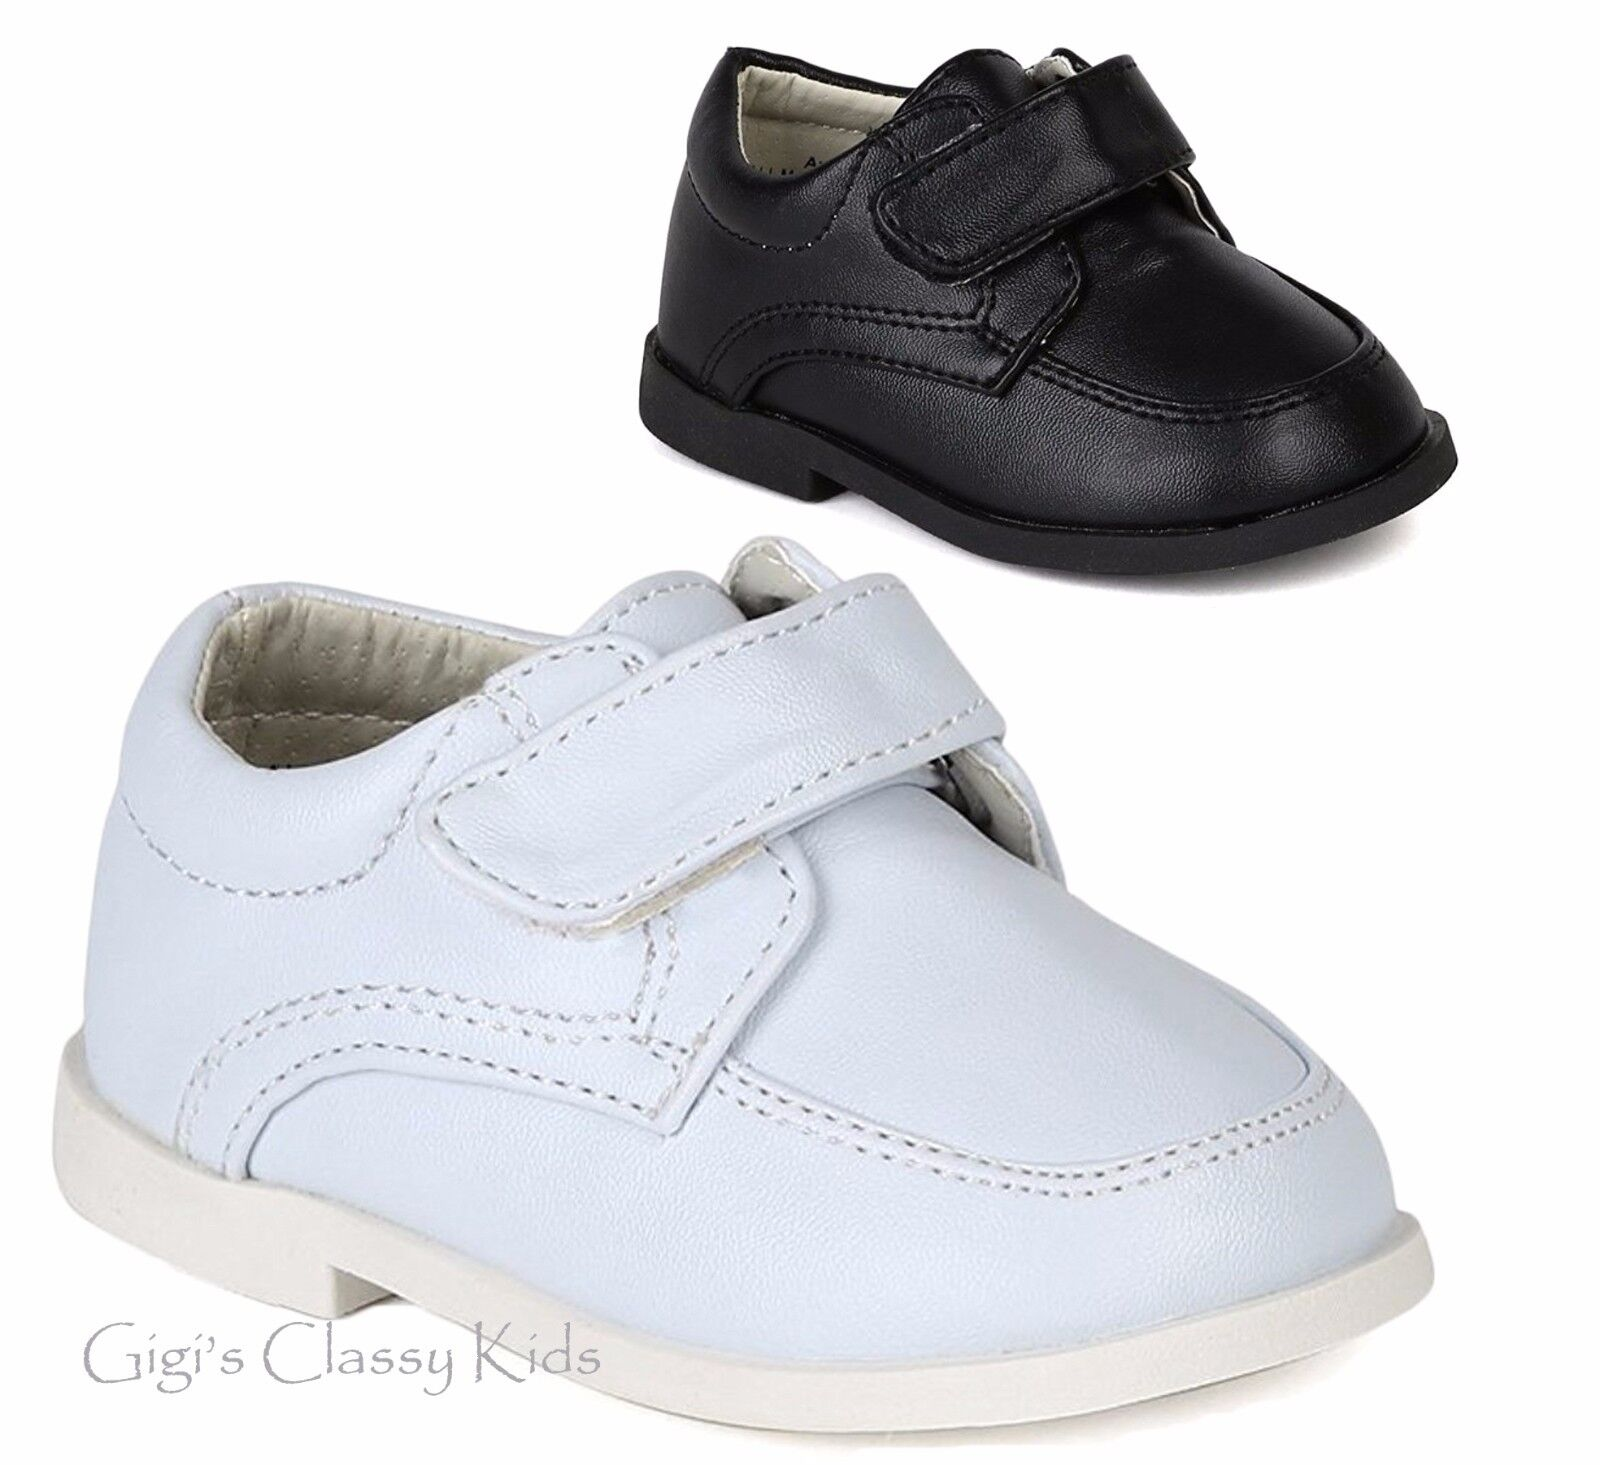 New Baby Toddler Boys White Black Dress Shoes Christening Baptism